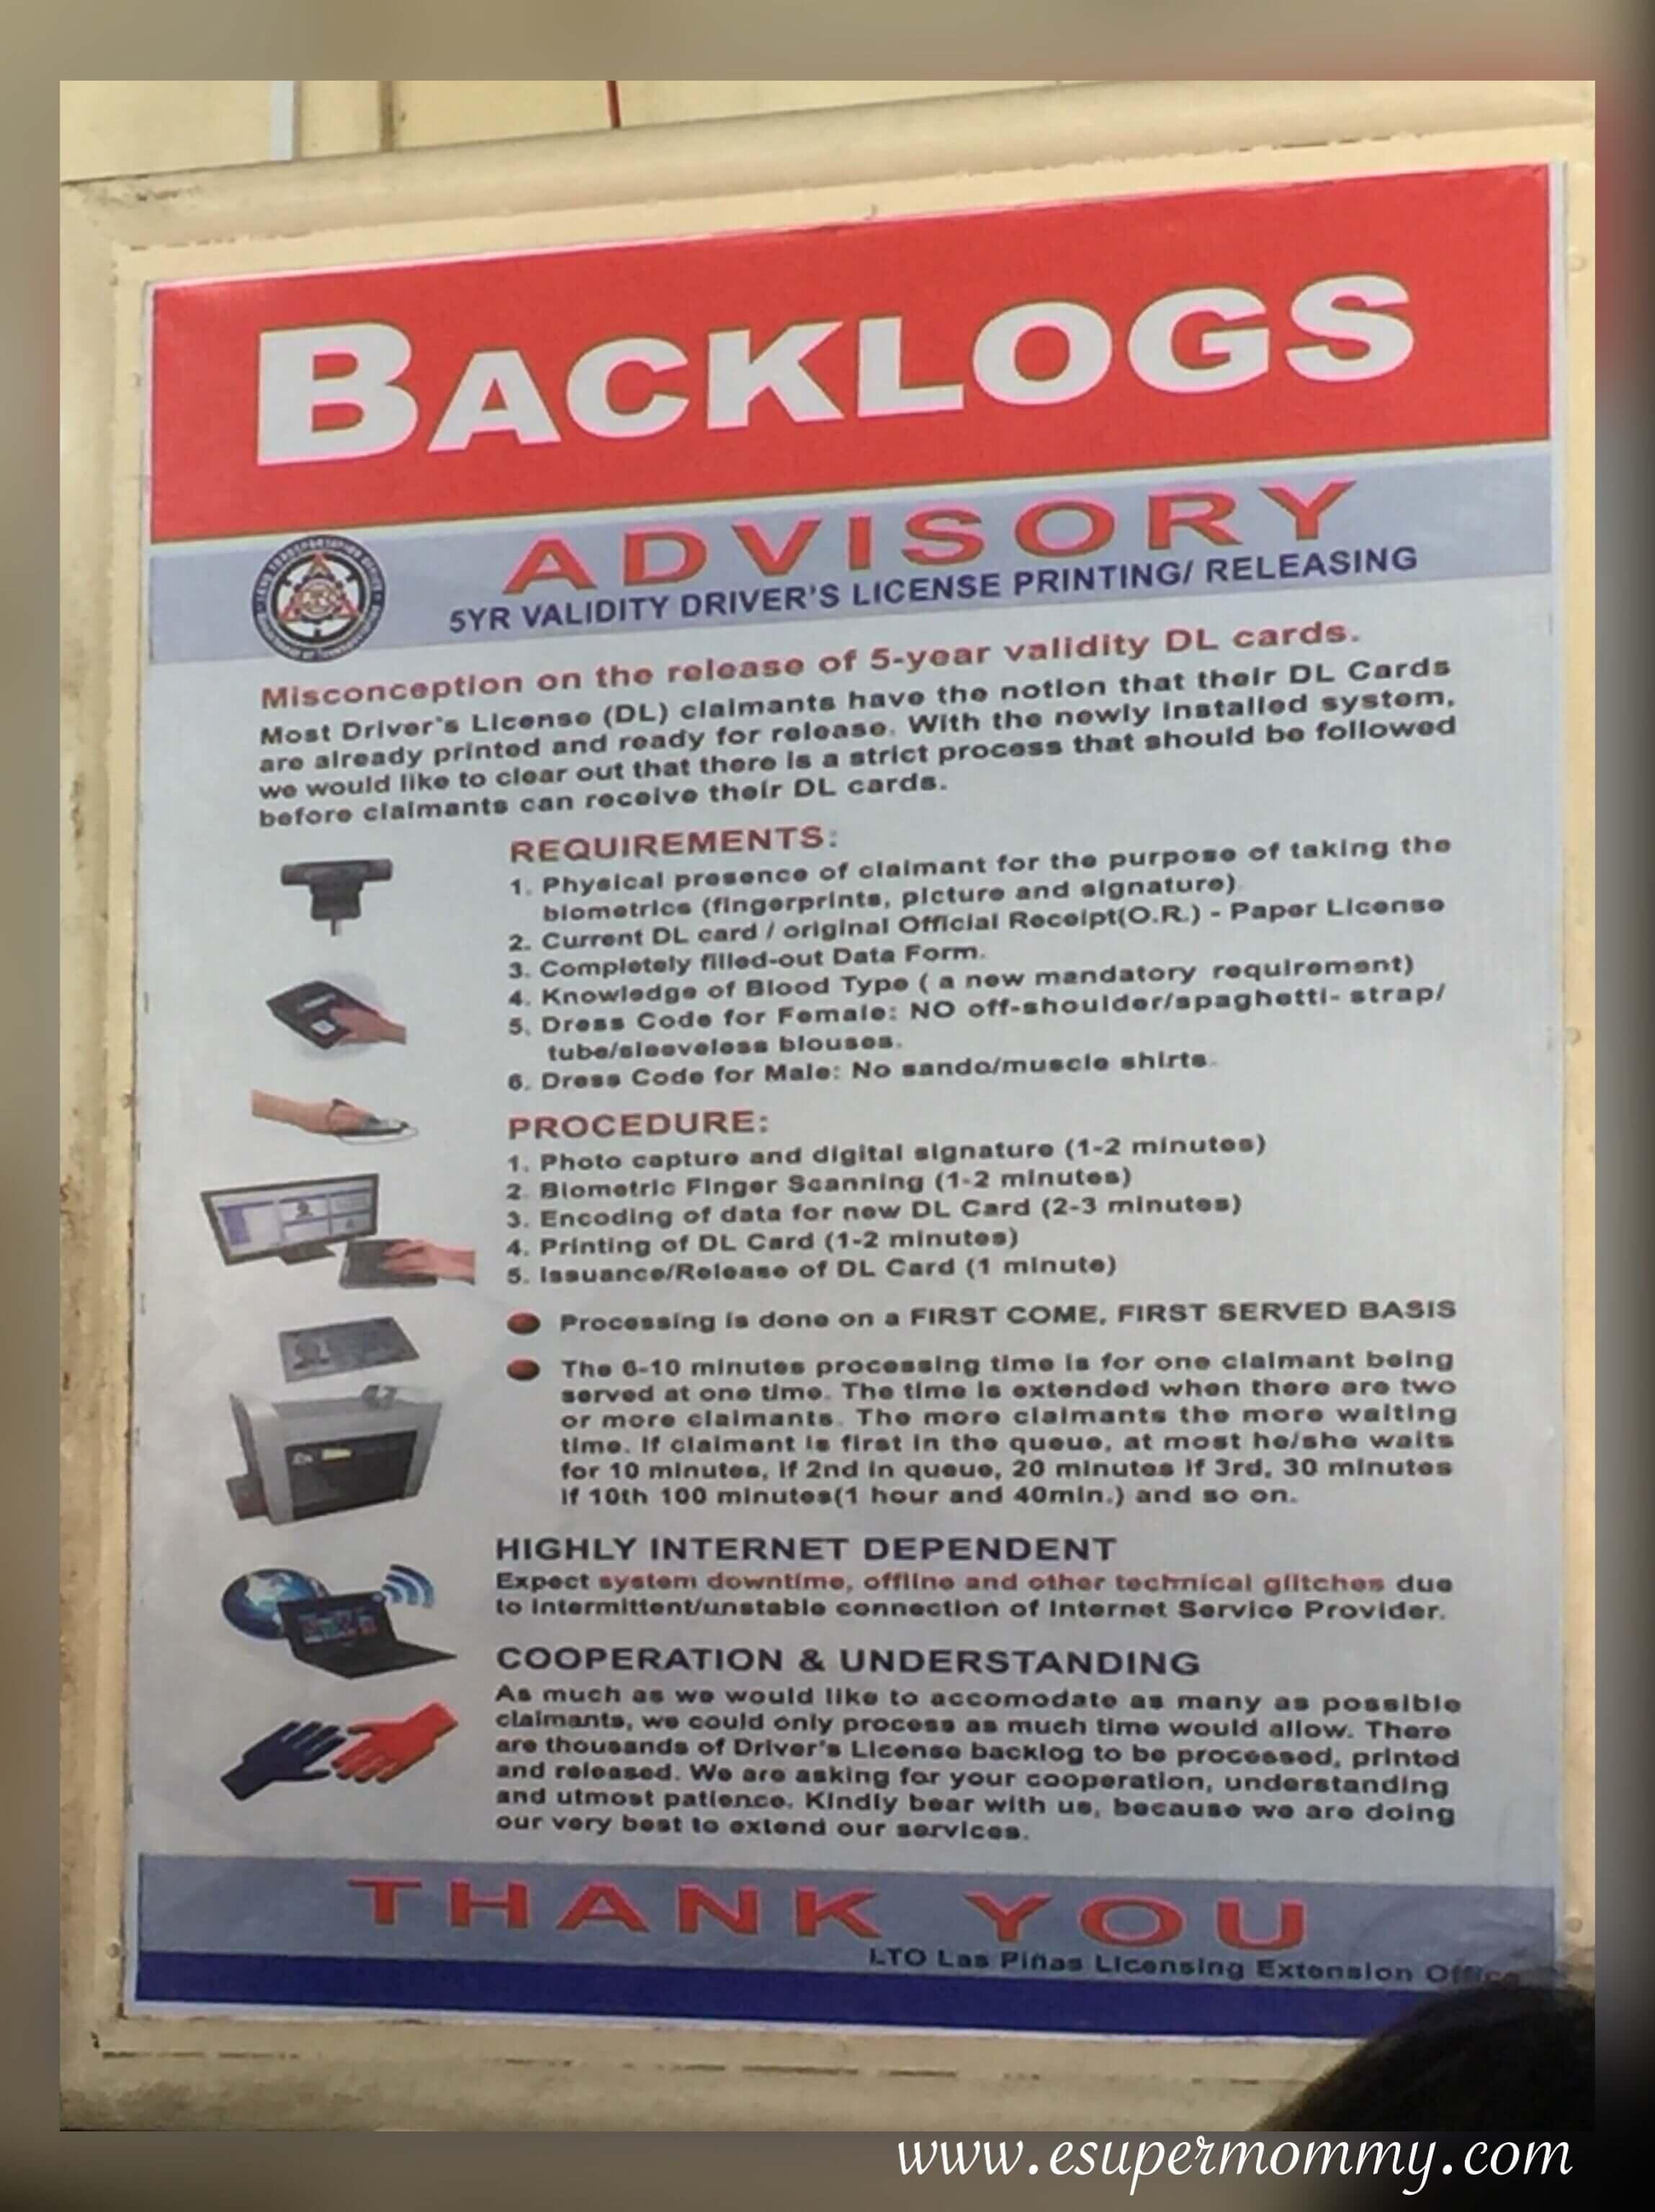 Tips on Backlogs LTO Driver's License 2018